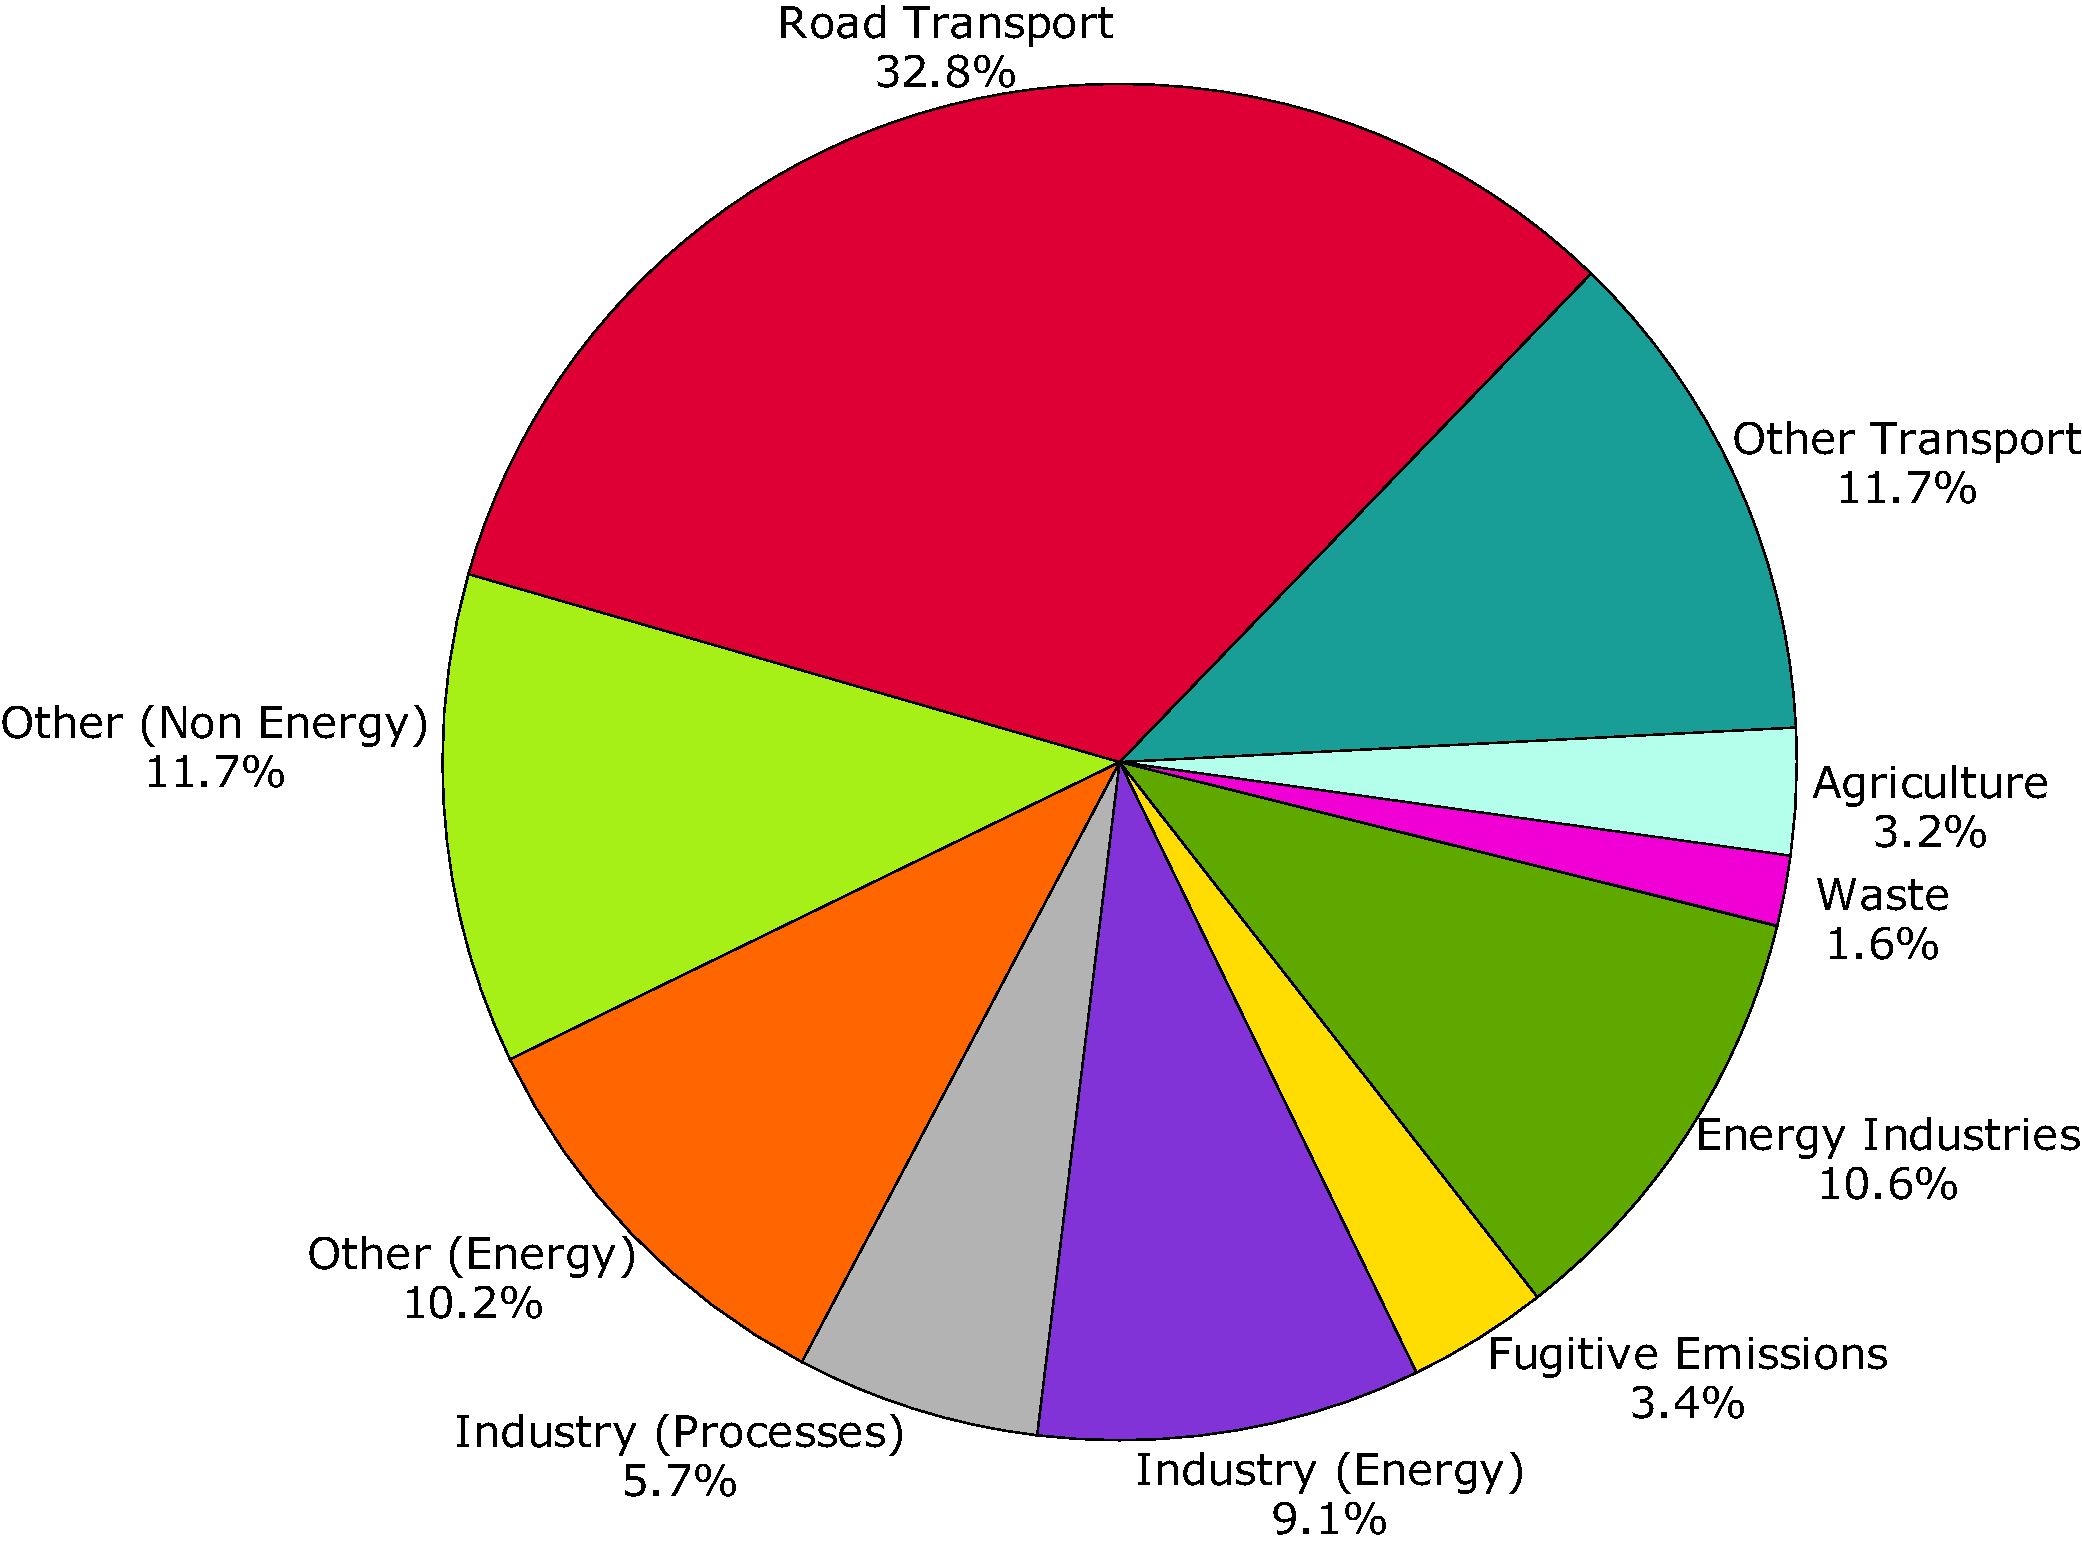 Sector split of emissions of ozone precursors (EEA member countries)